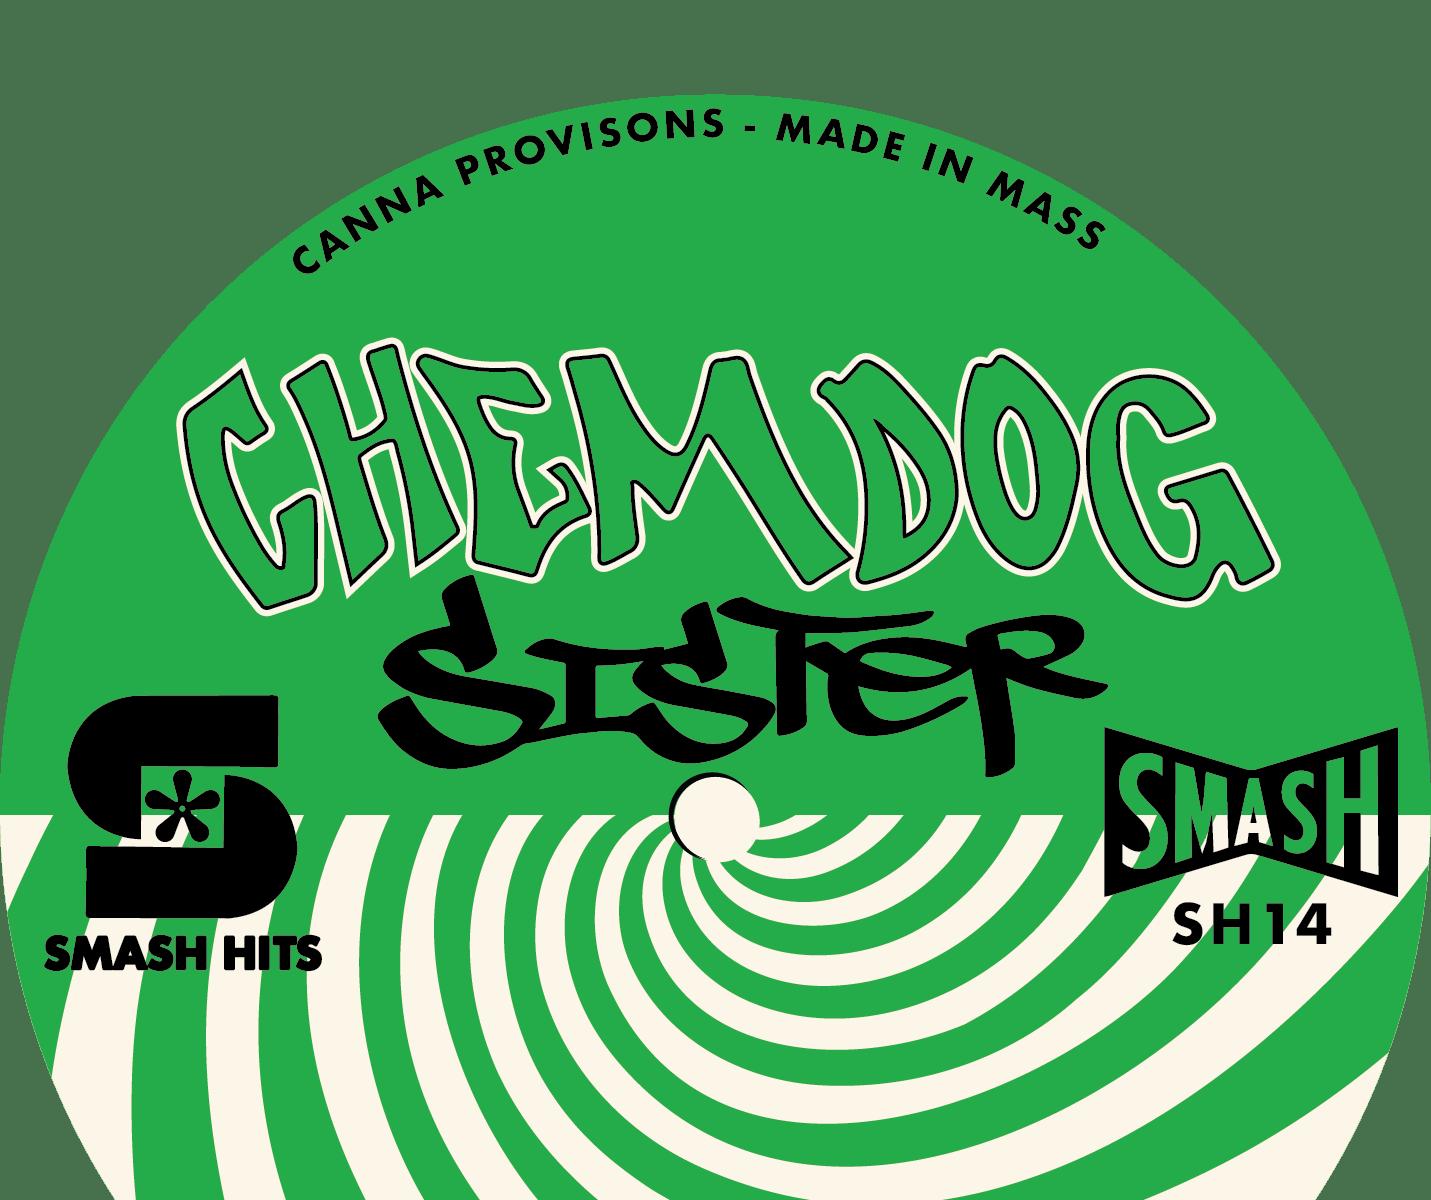 chem sis smash hits cannabis chemdog canna provisions